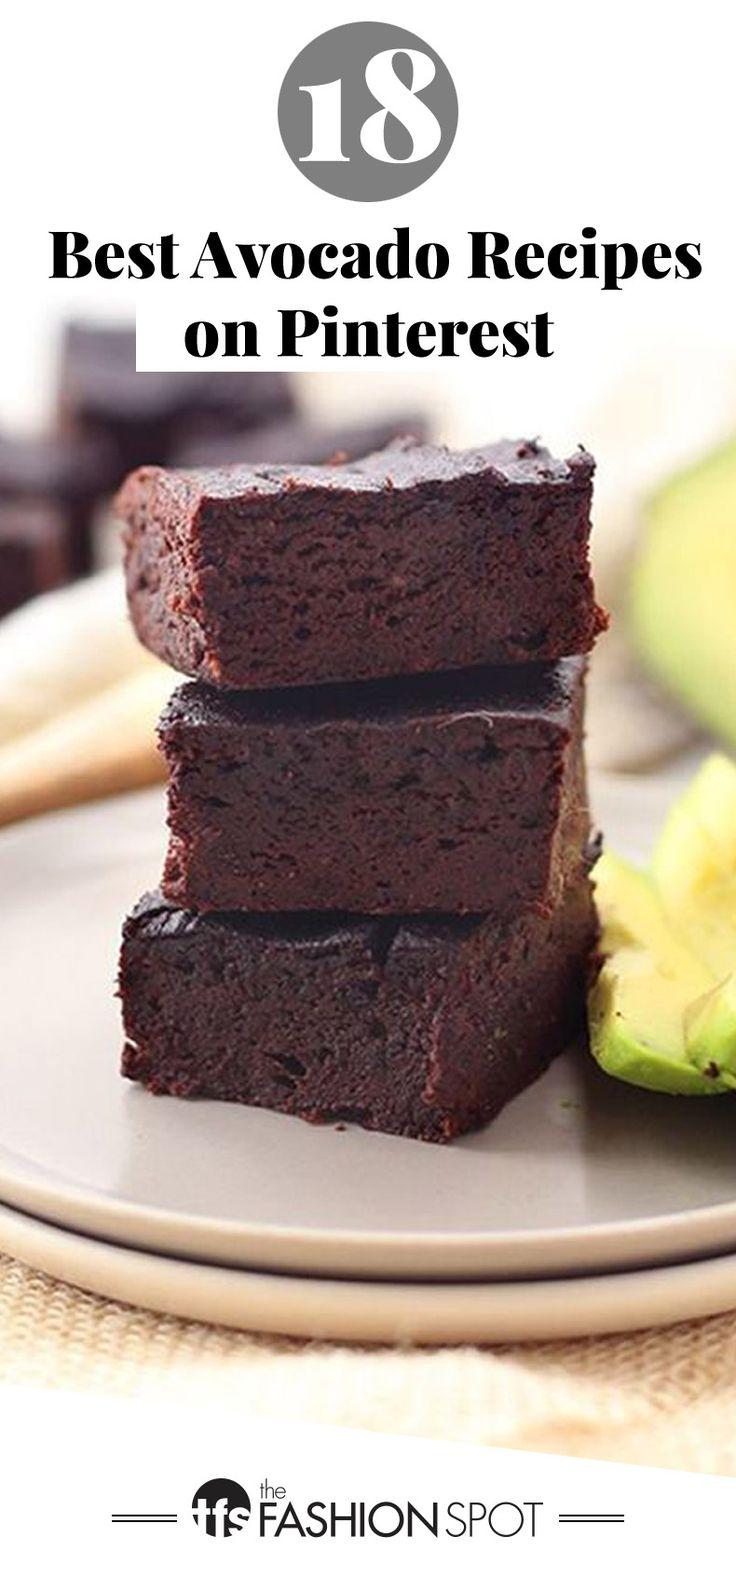 18 best avocado recipes on Pinterest